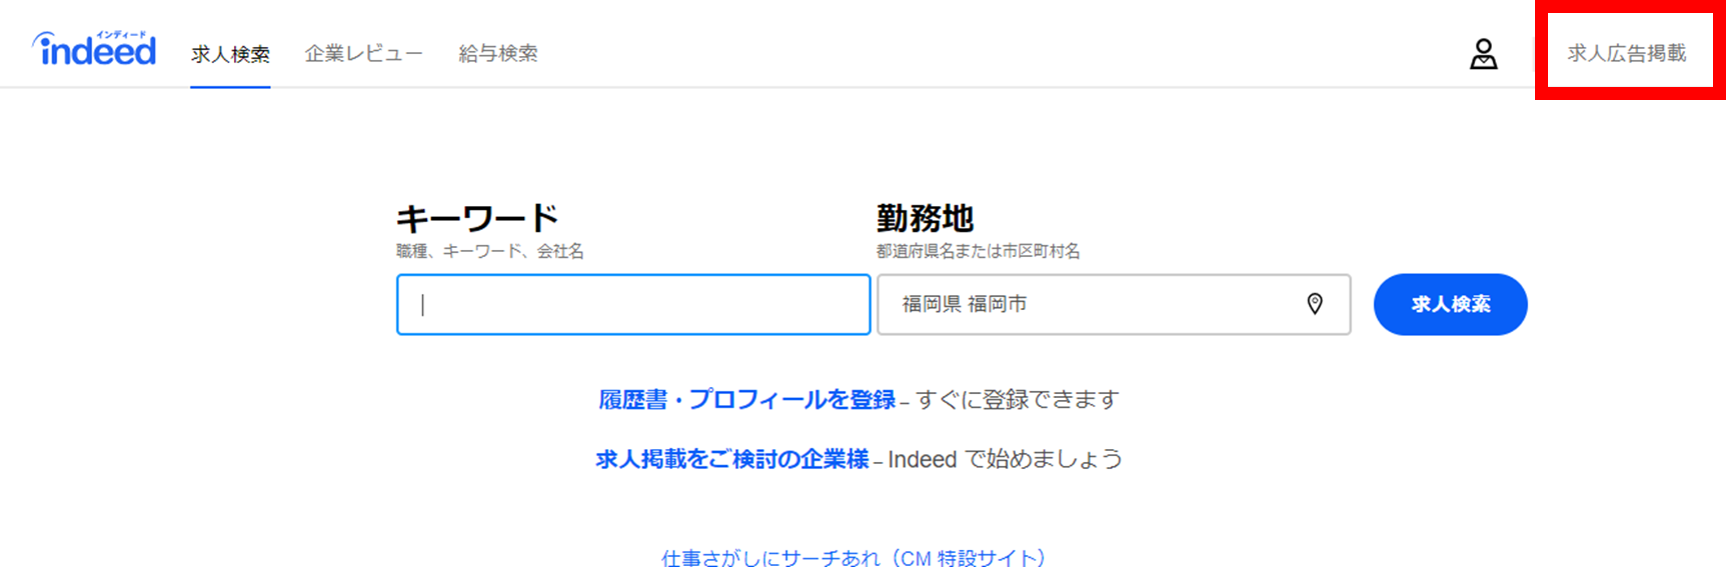 Indeed公式サイトのトップページ